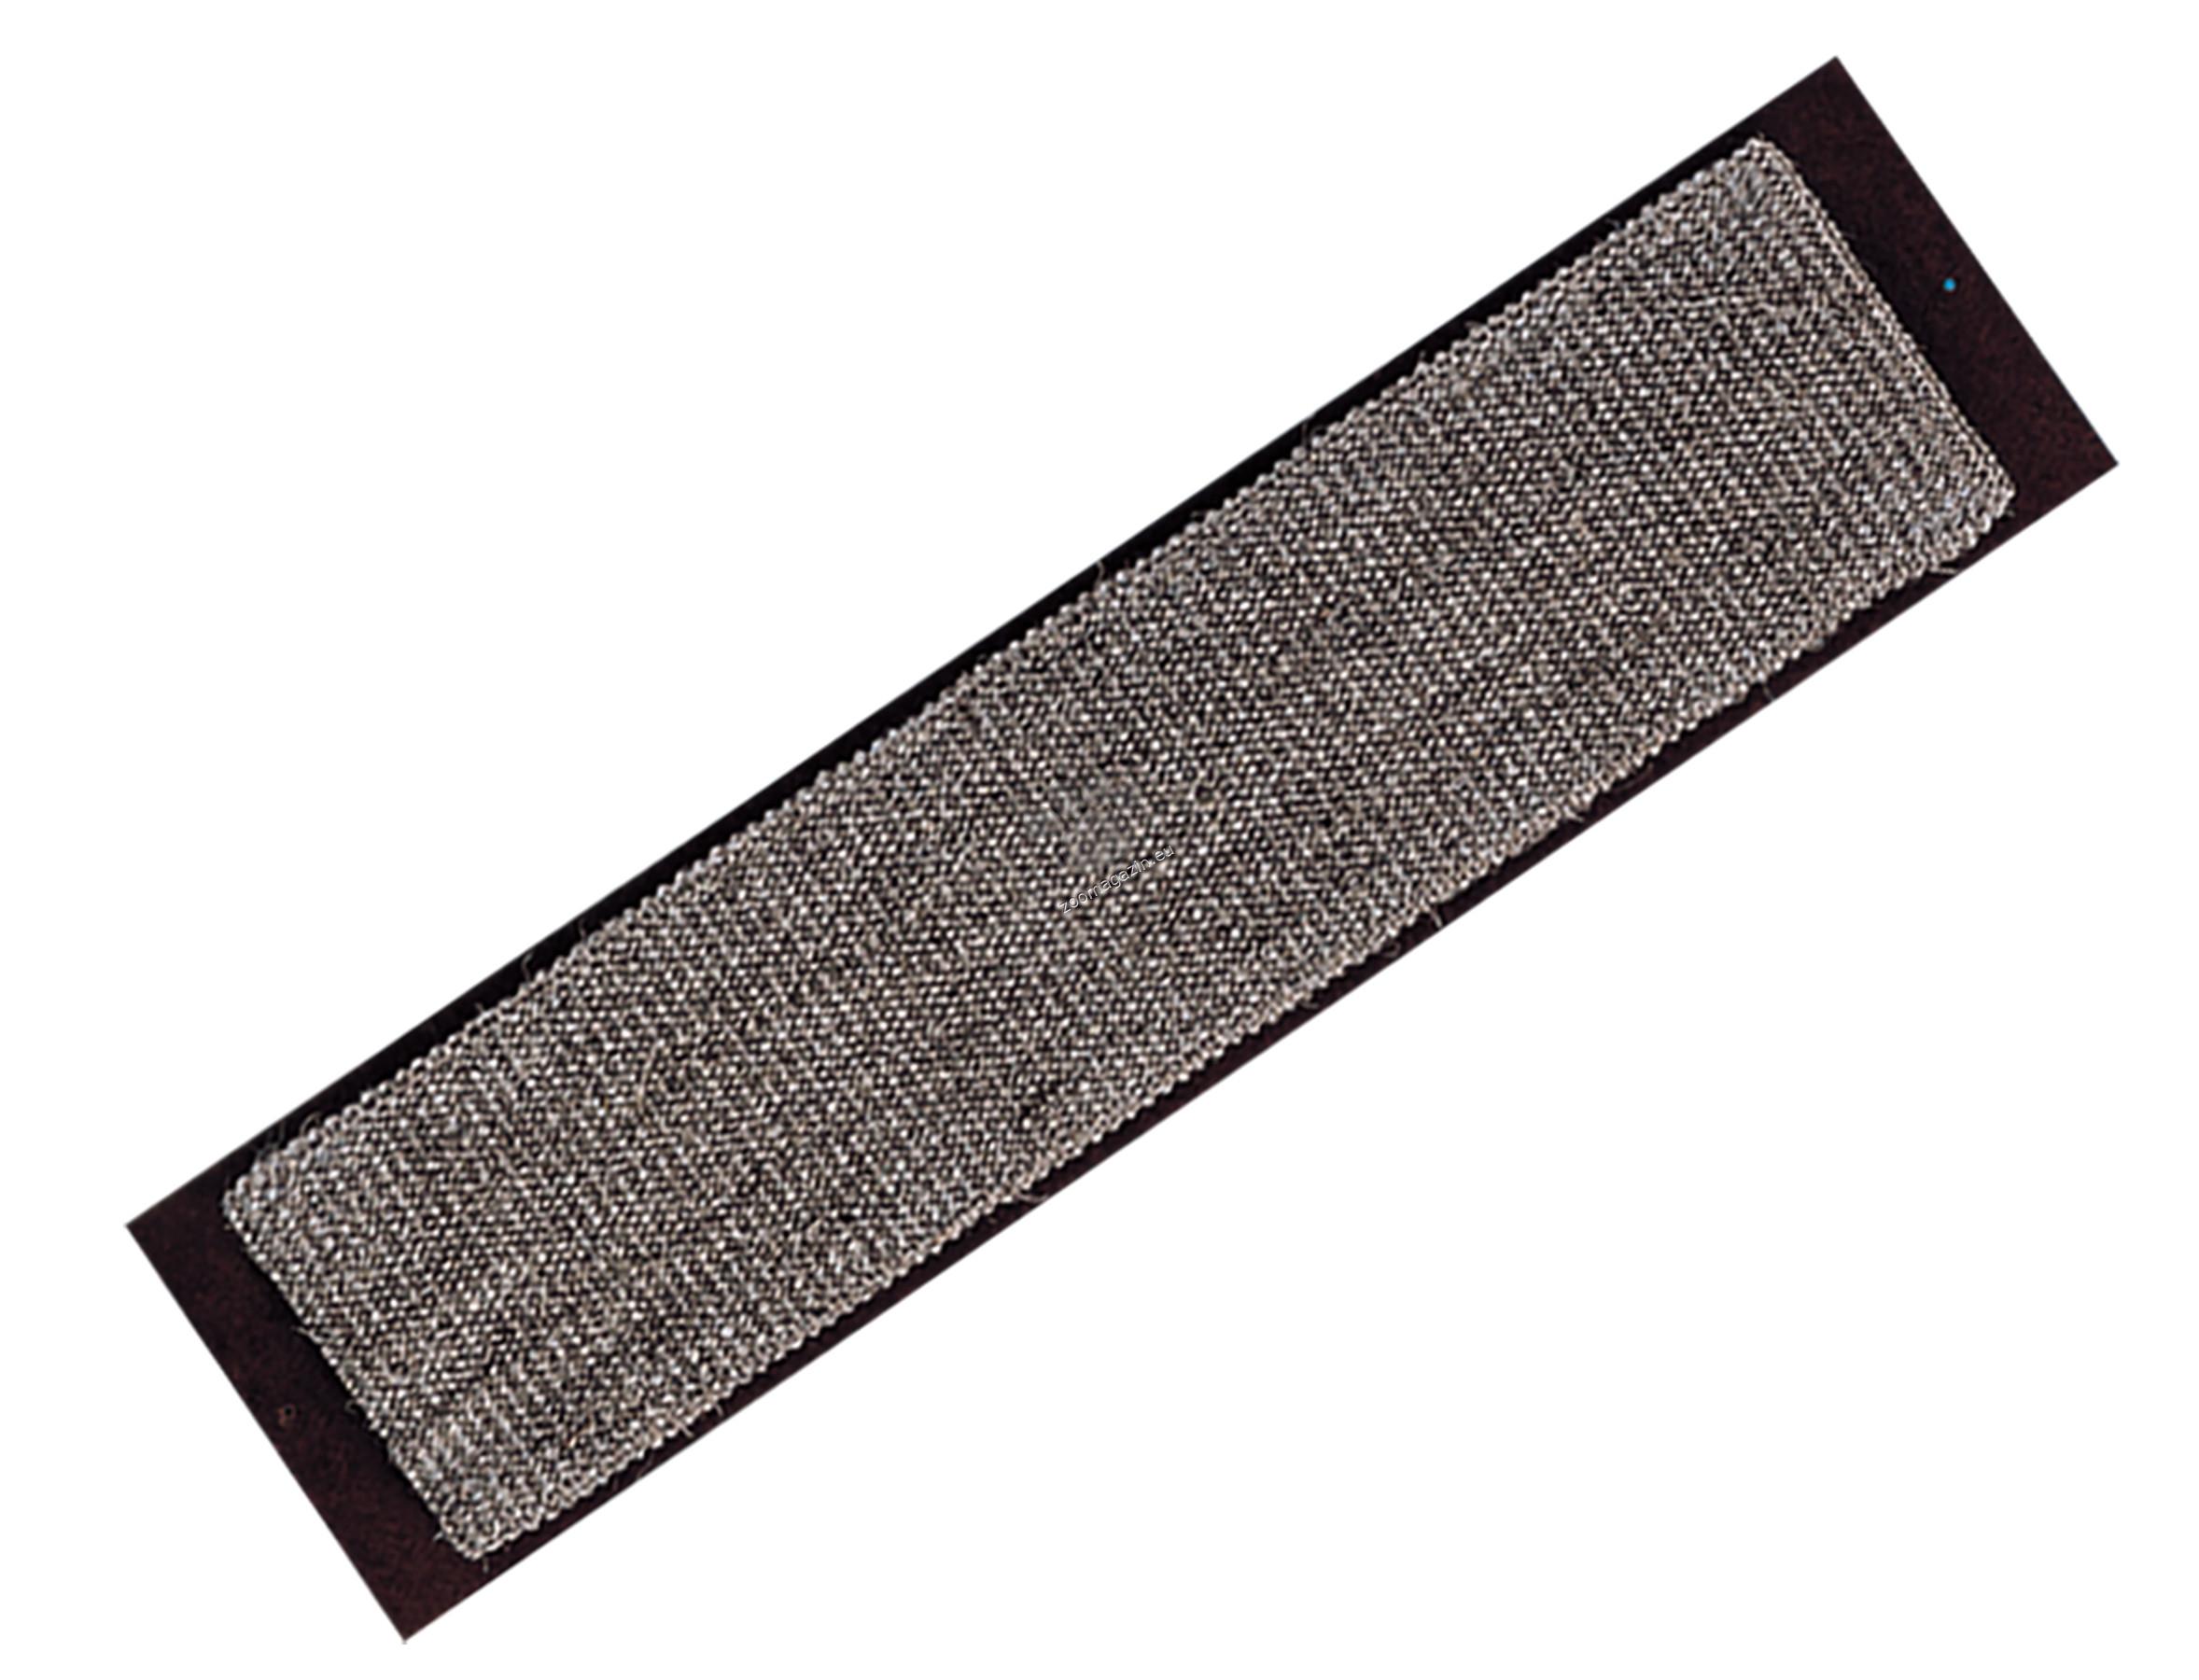 Vadigran Scratching board - Kотешка драскалка 70 / 18 см.